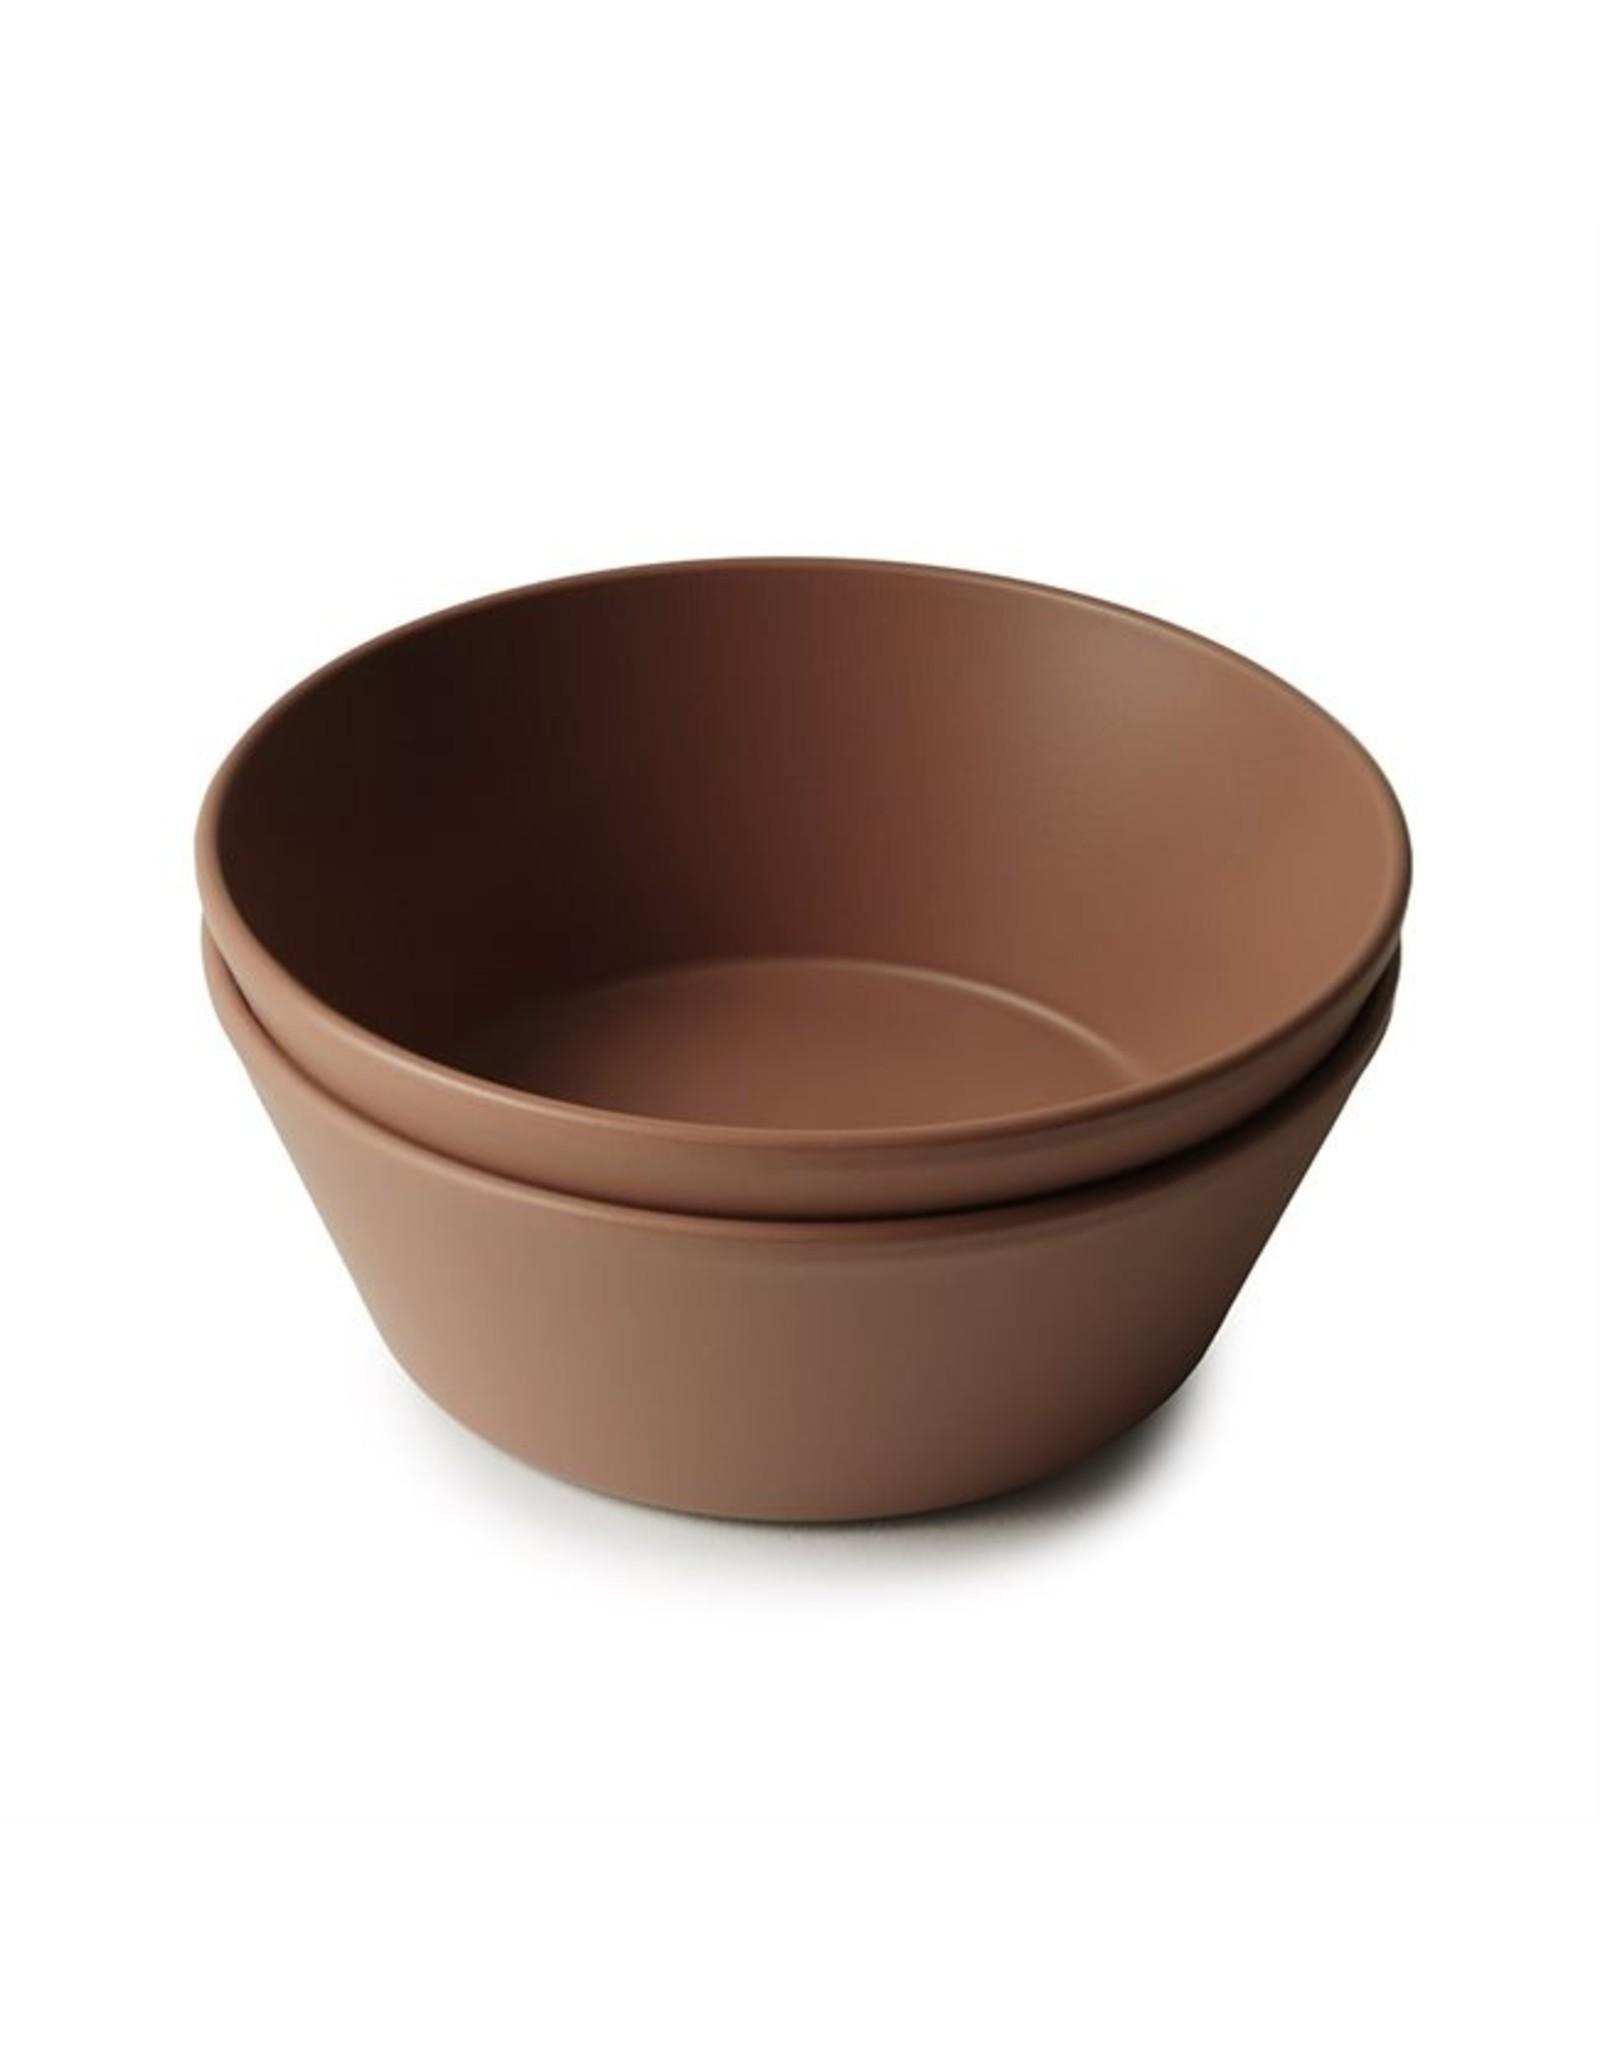 Mushie Bowl round Caramel (2 PCS)